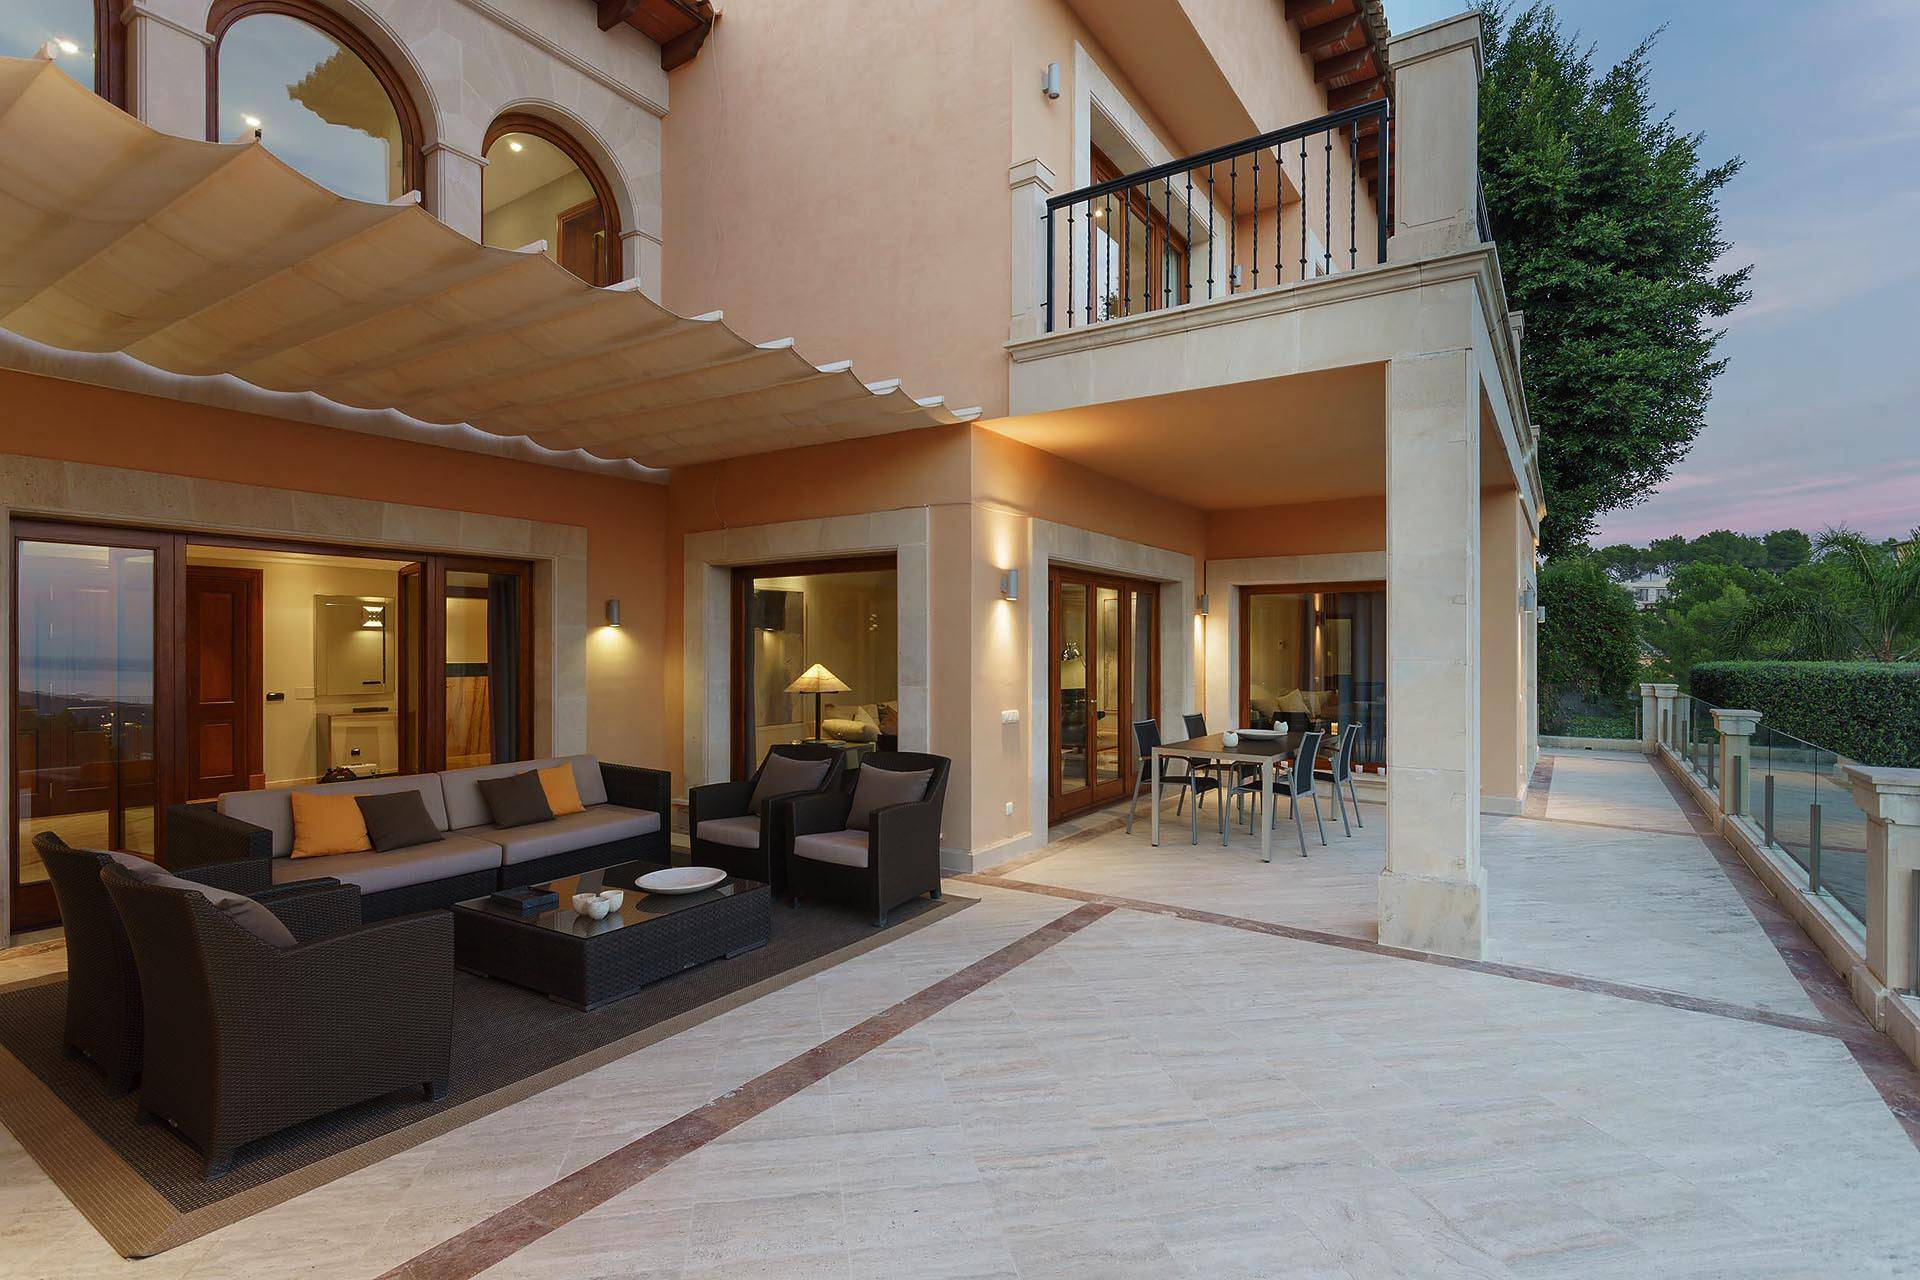 01-280 großzügige Villa nahe Palma de Mallorca Bild 10